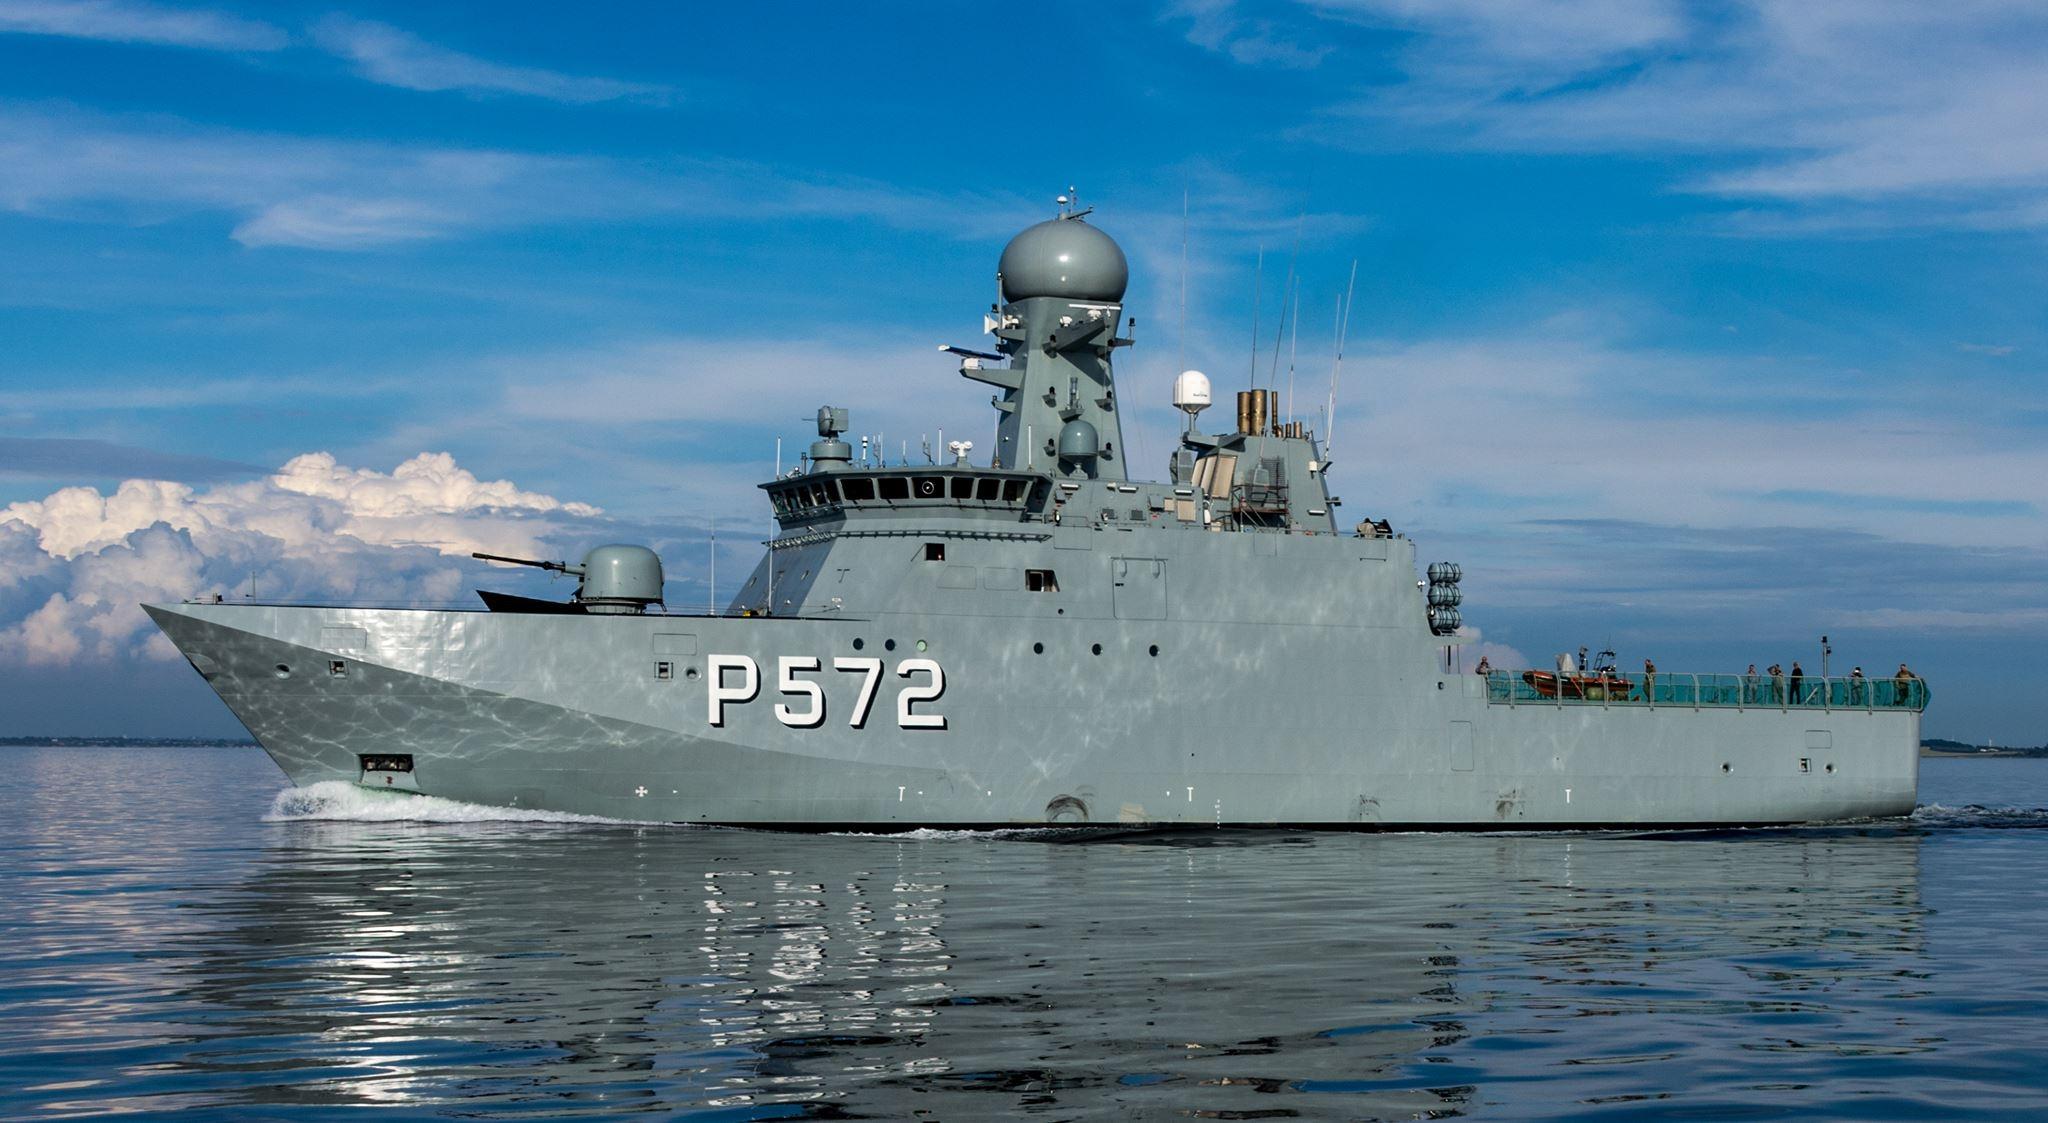 Royal Danish Navy/1. Eskadre